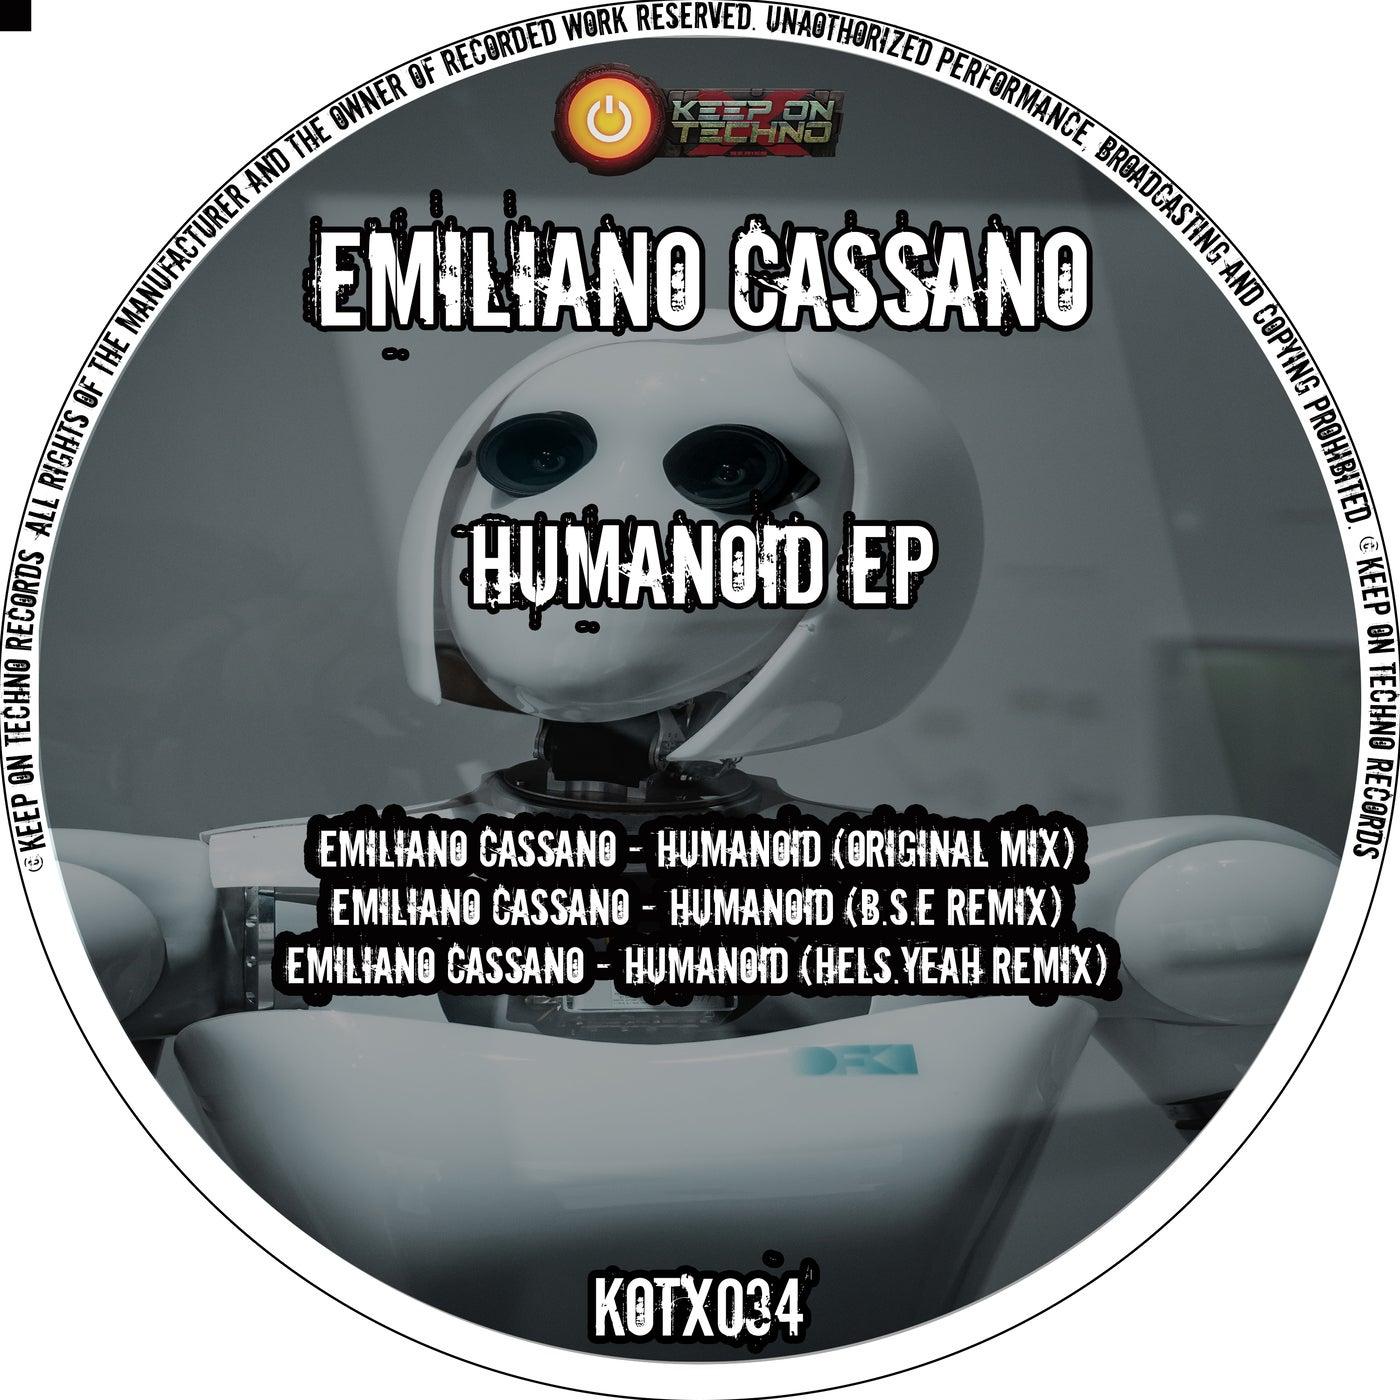 Humanoid (Hels.Yeah Remix)